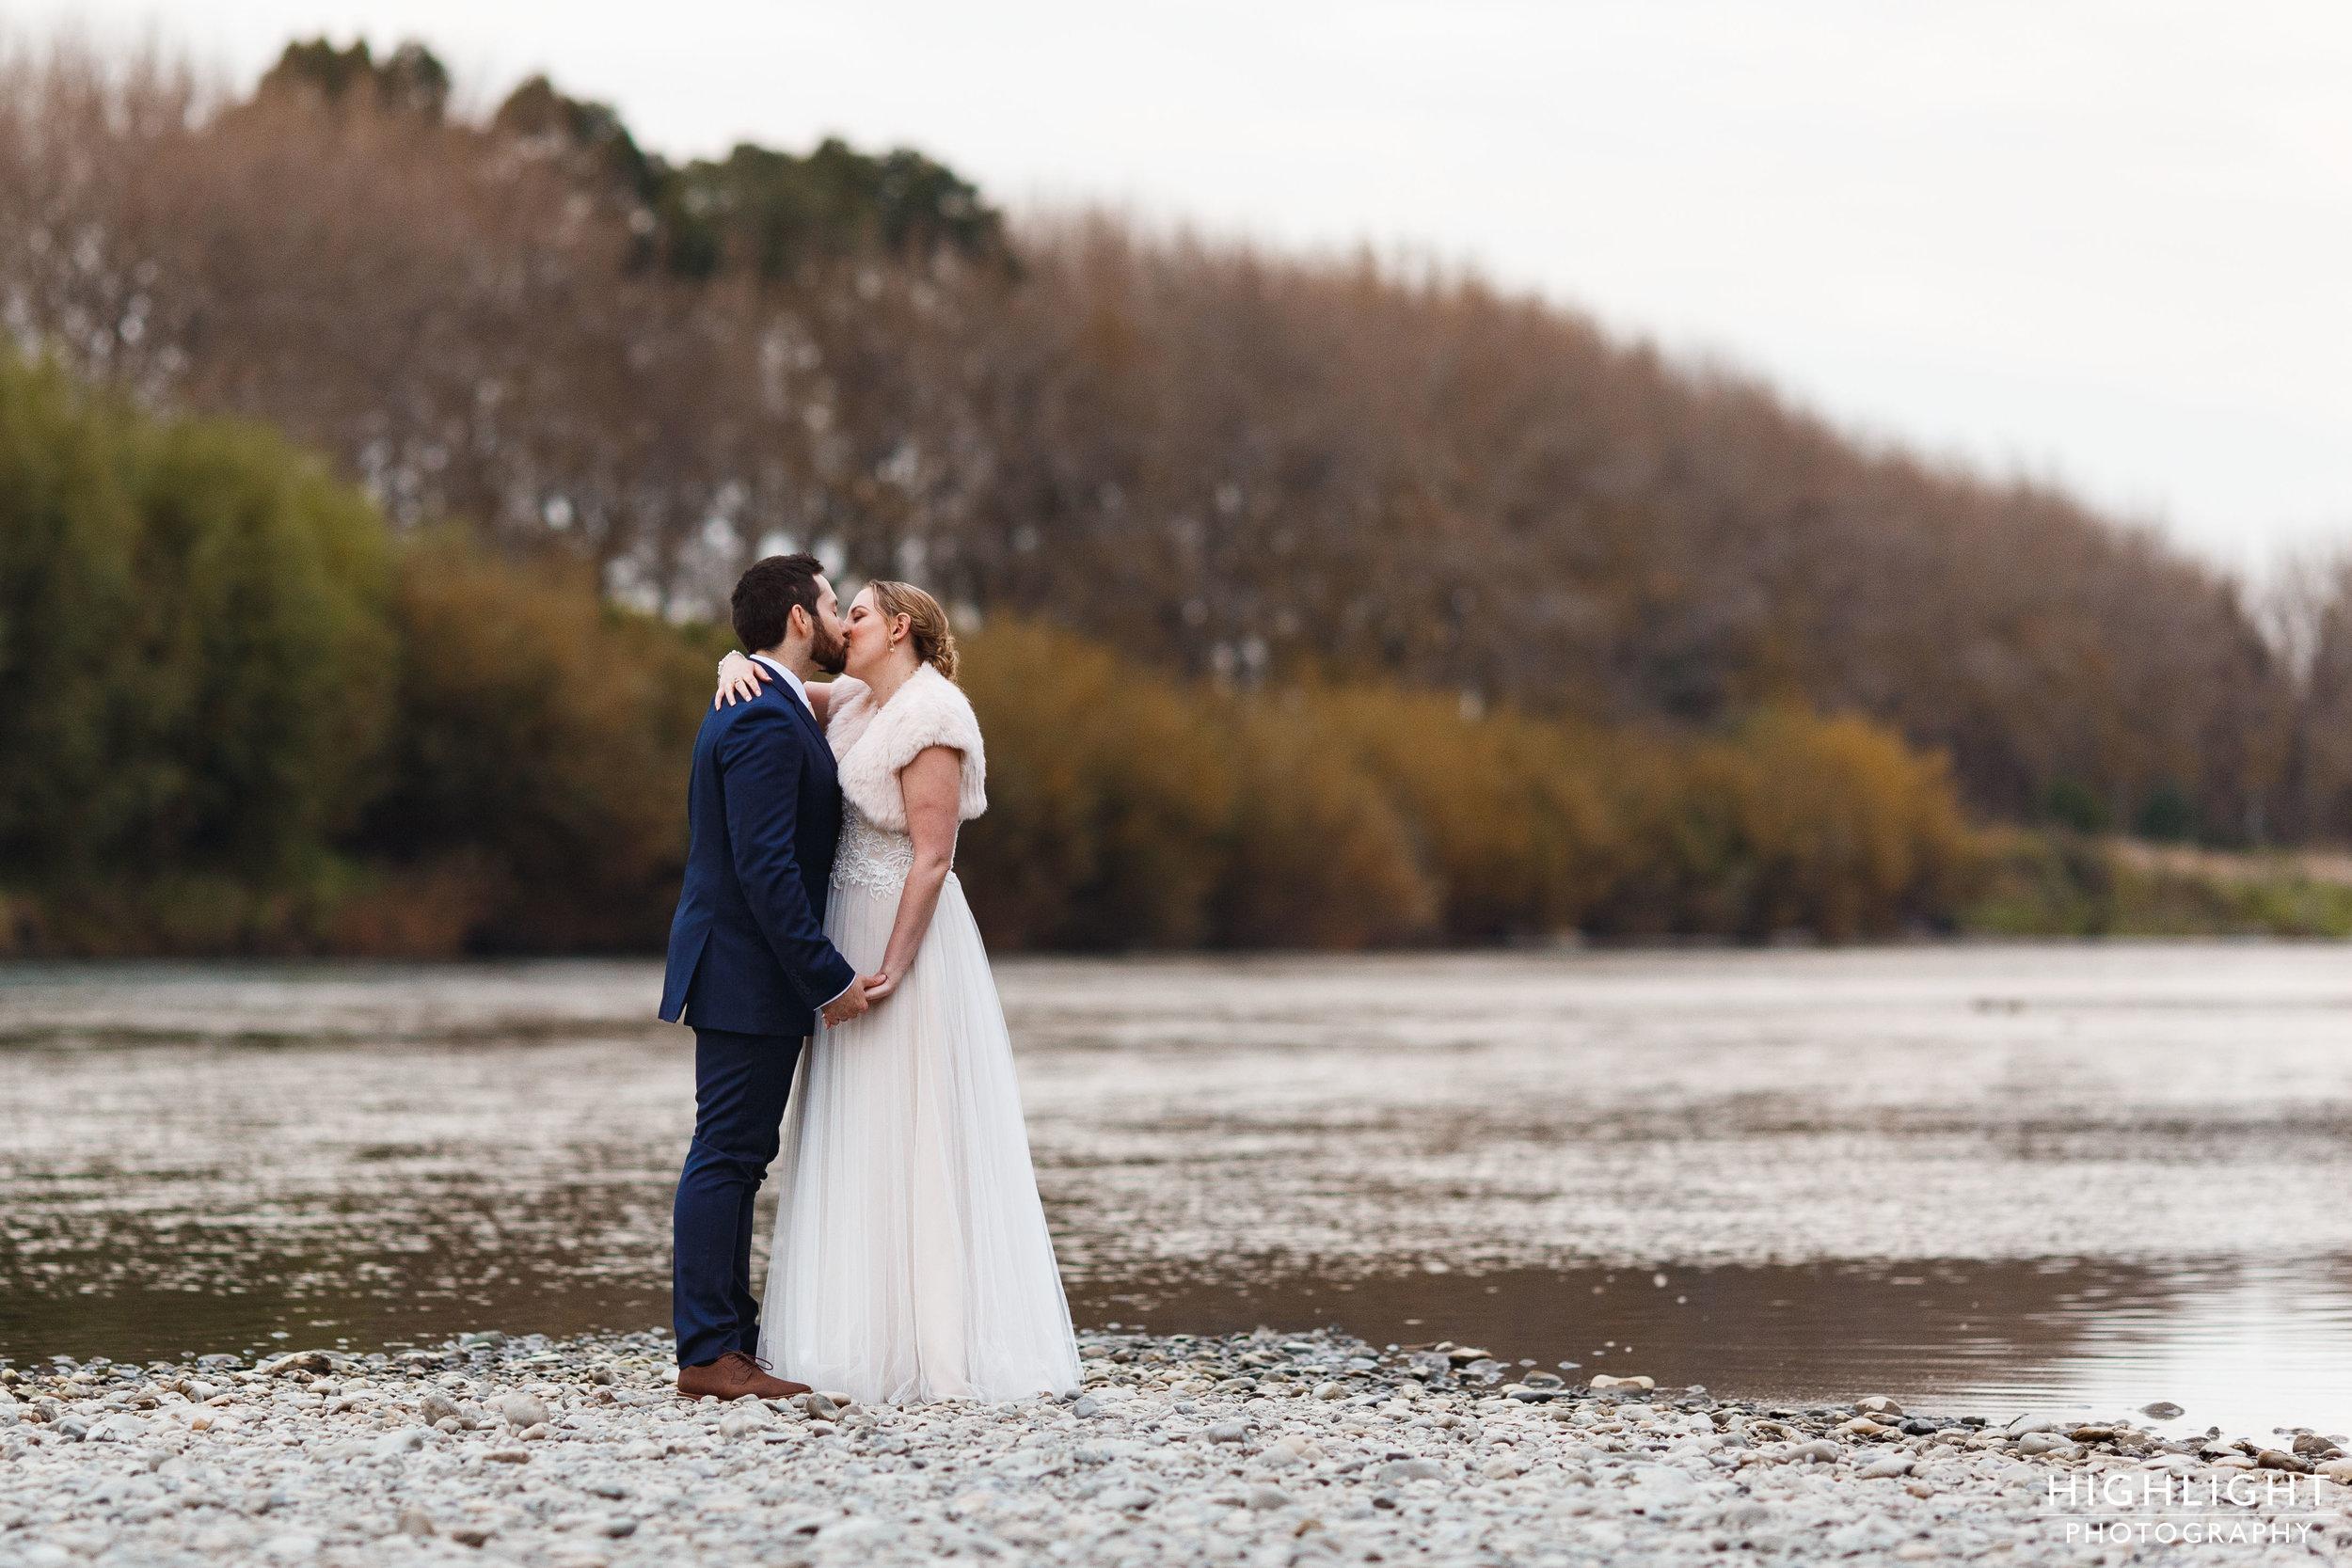 highlight-wedding-photography-palmerston-north-new-zealand-manawatu-chalet-86.jpg